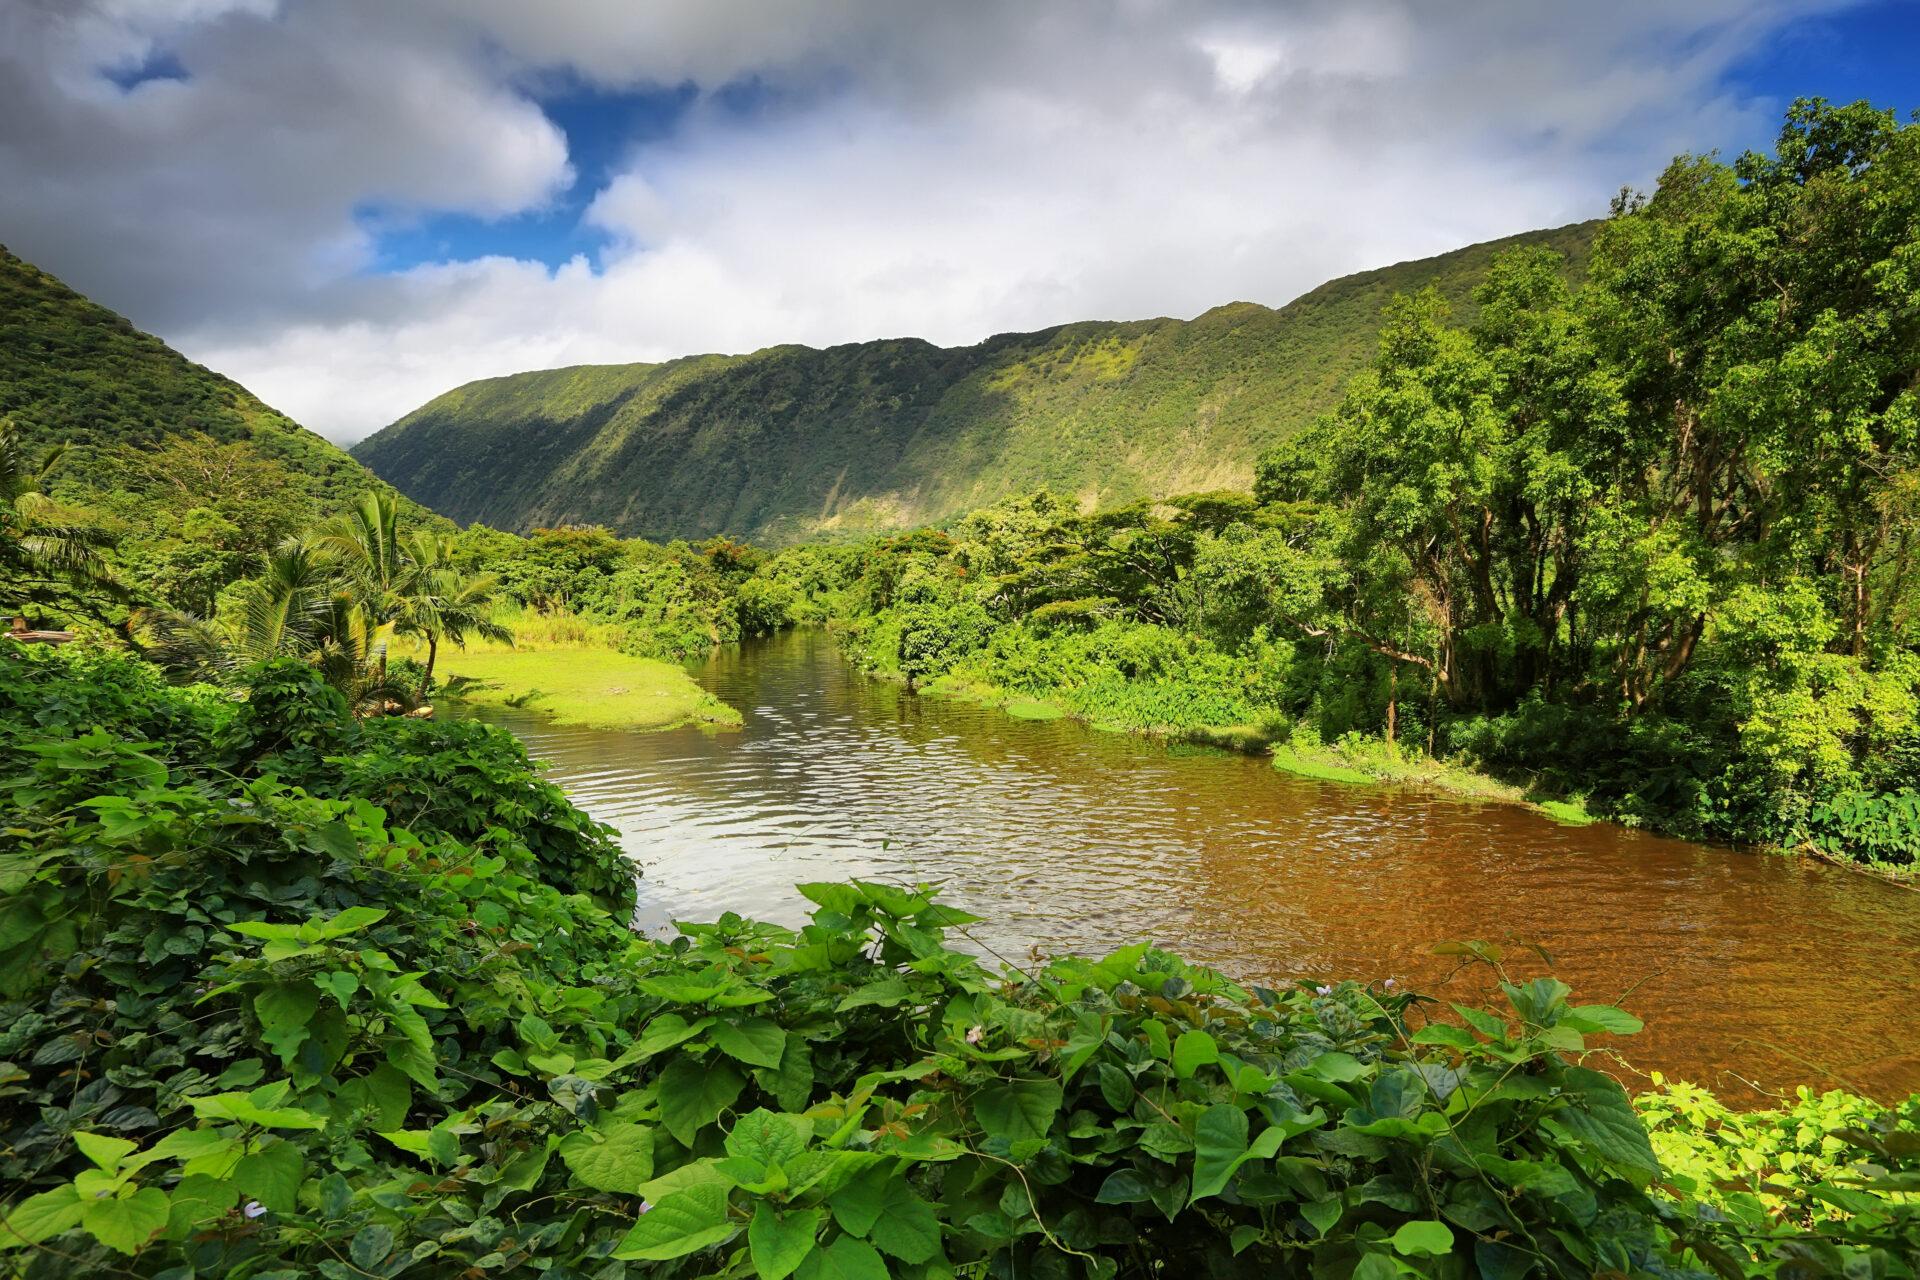 26225223 - view of the river in waipio valley, big island, hawaii